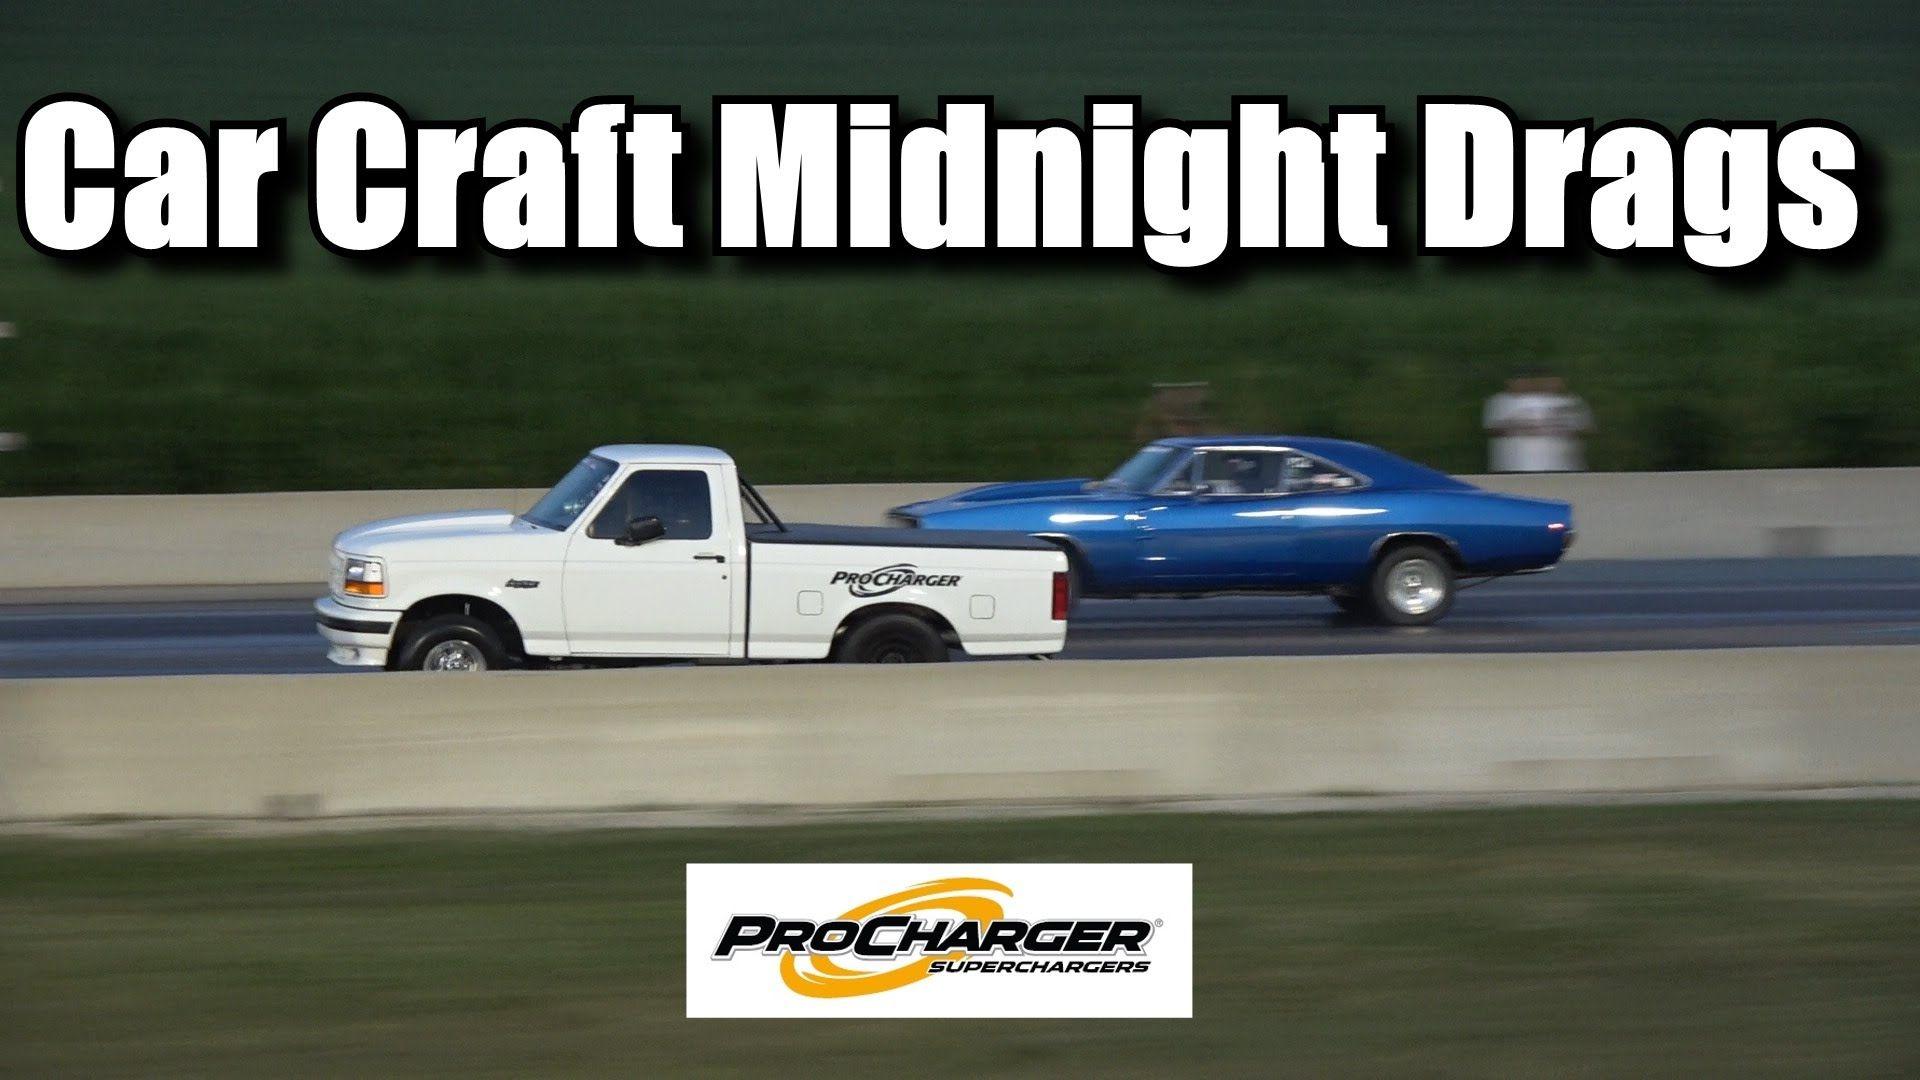 Procharger Ford Lightning Carcraftmidnightdrags Ford Lightning Car Craft Car